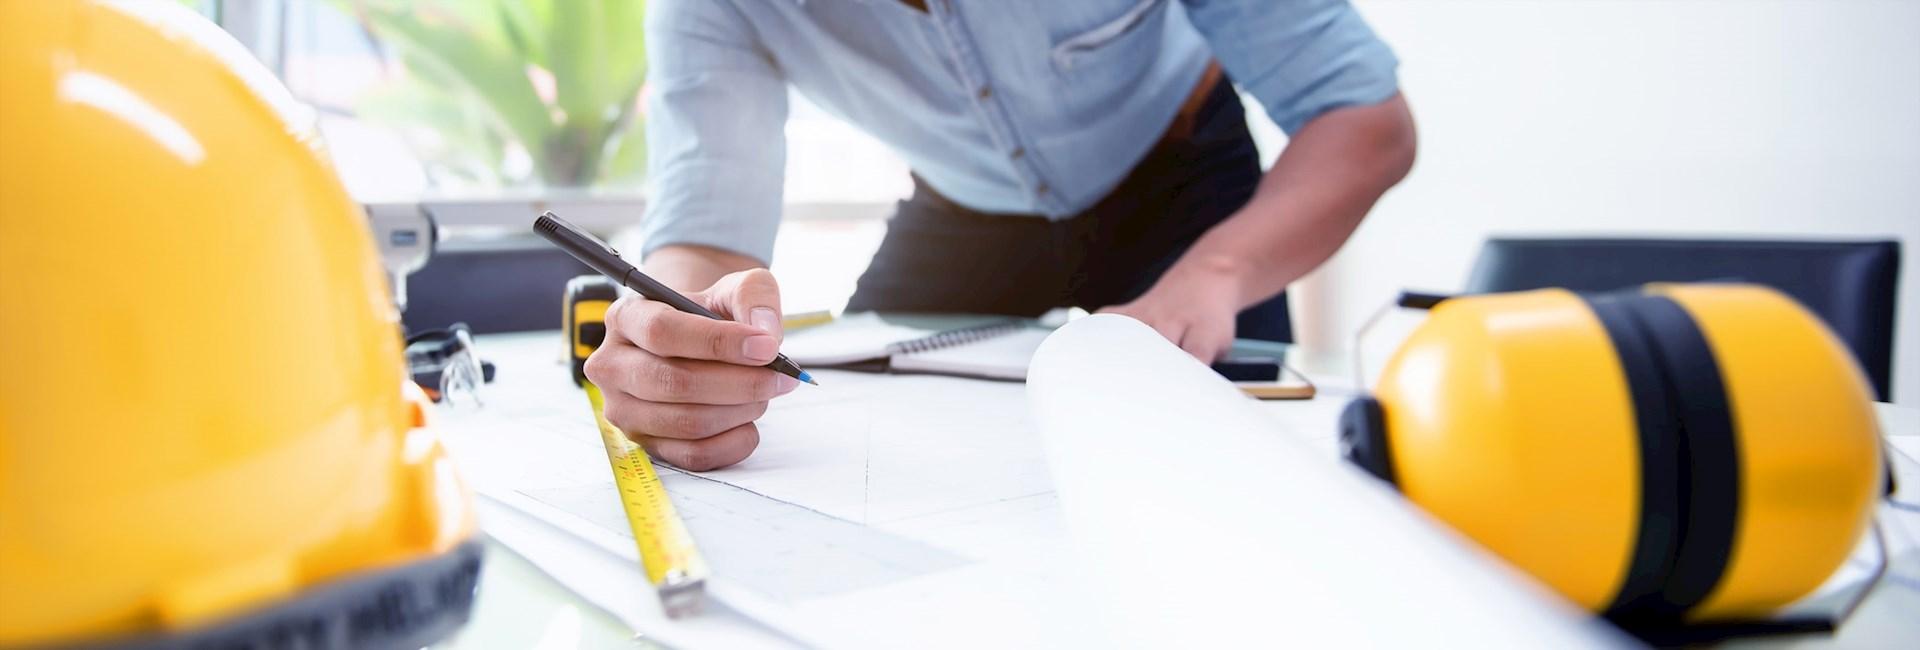 industry workforce planning